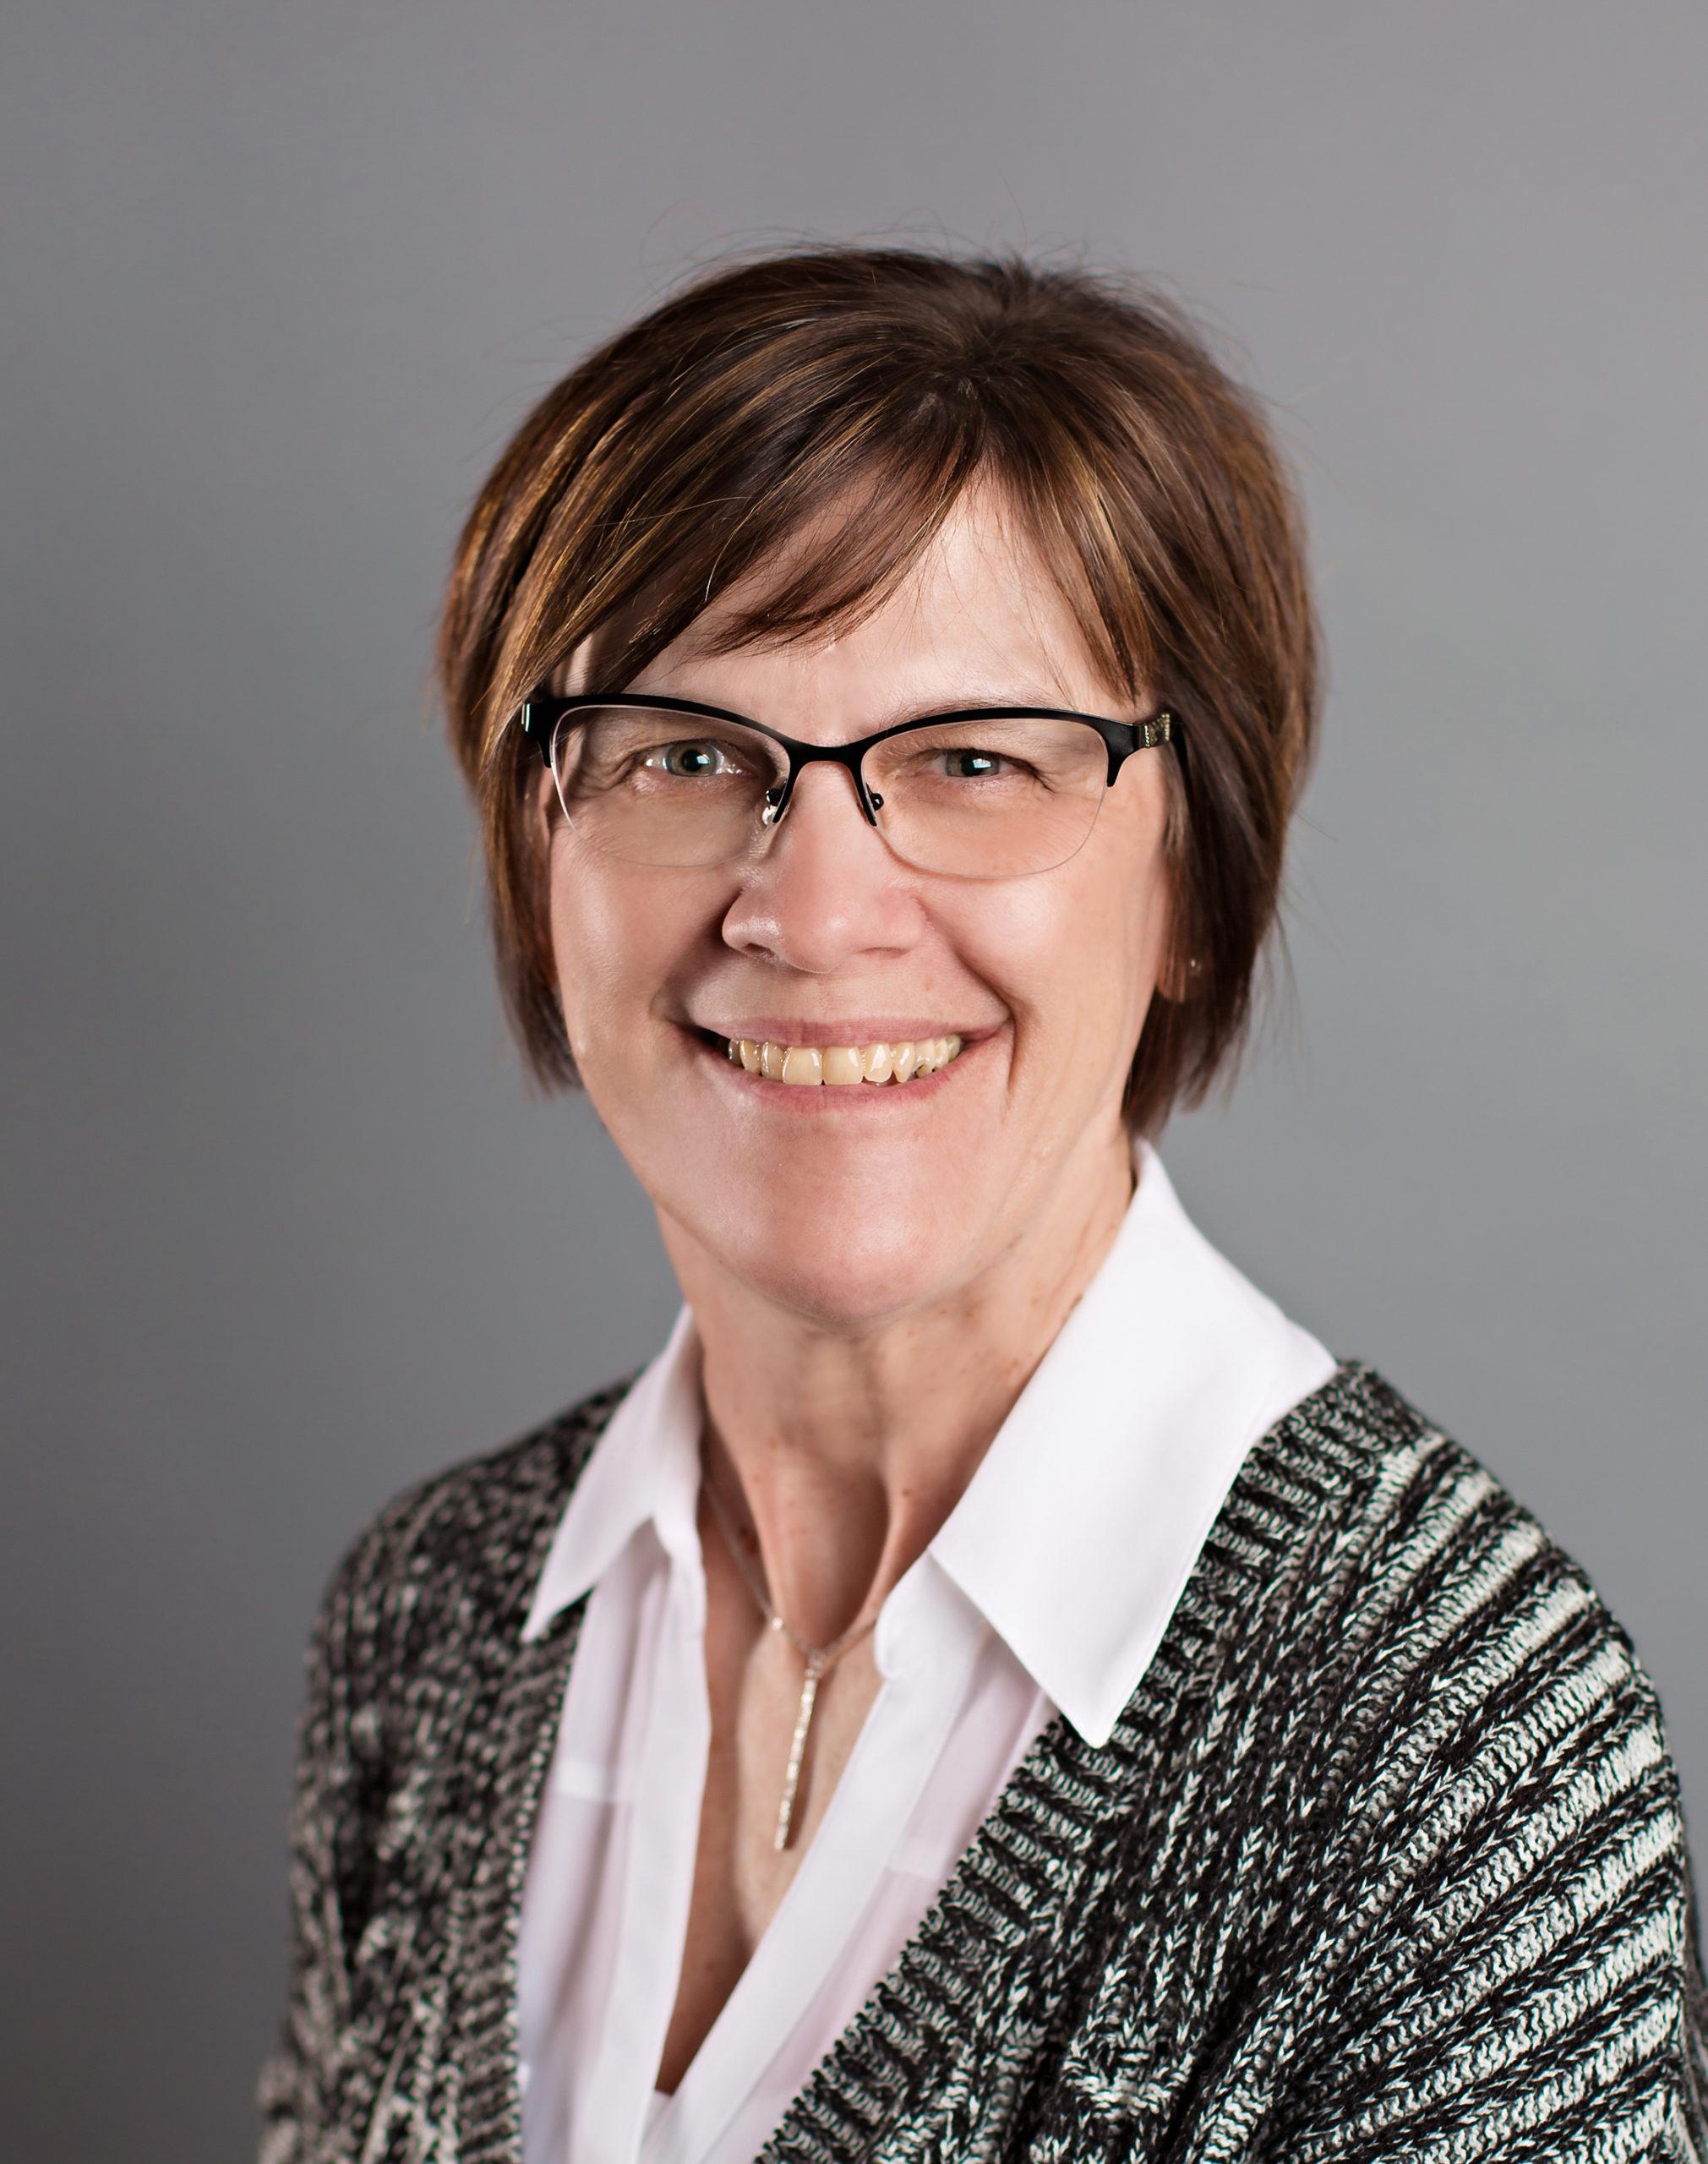 Janice Richter